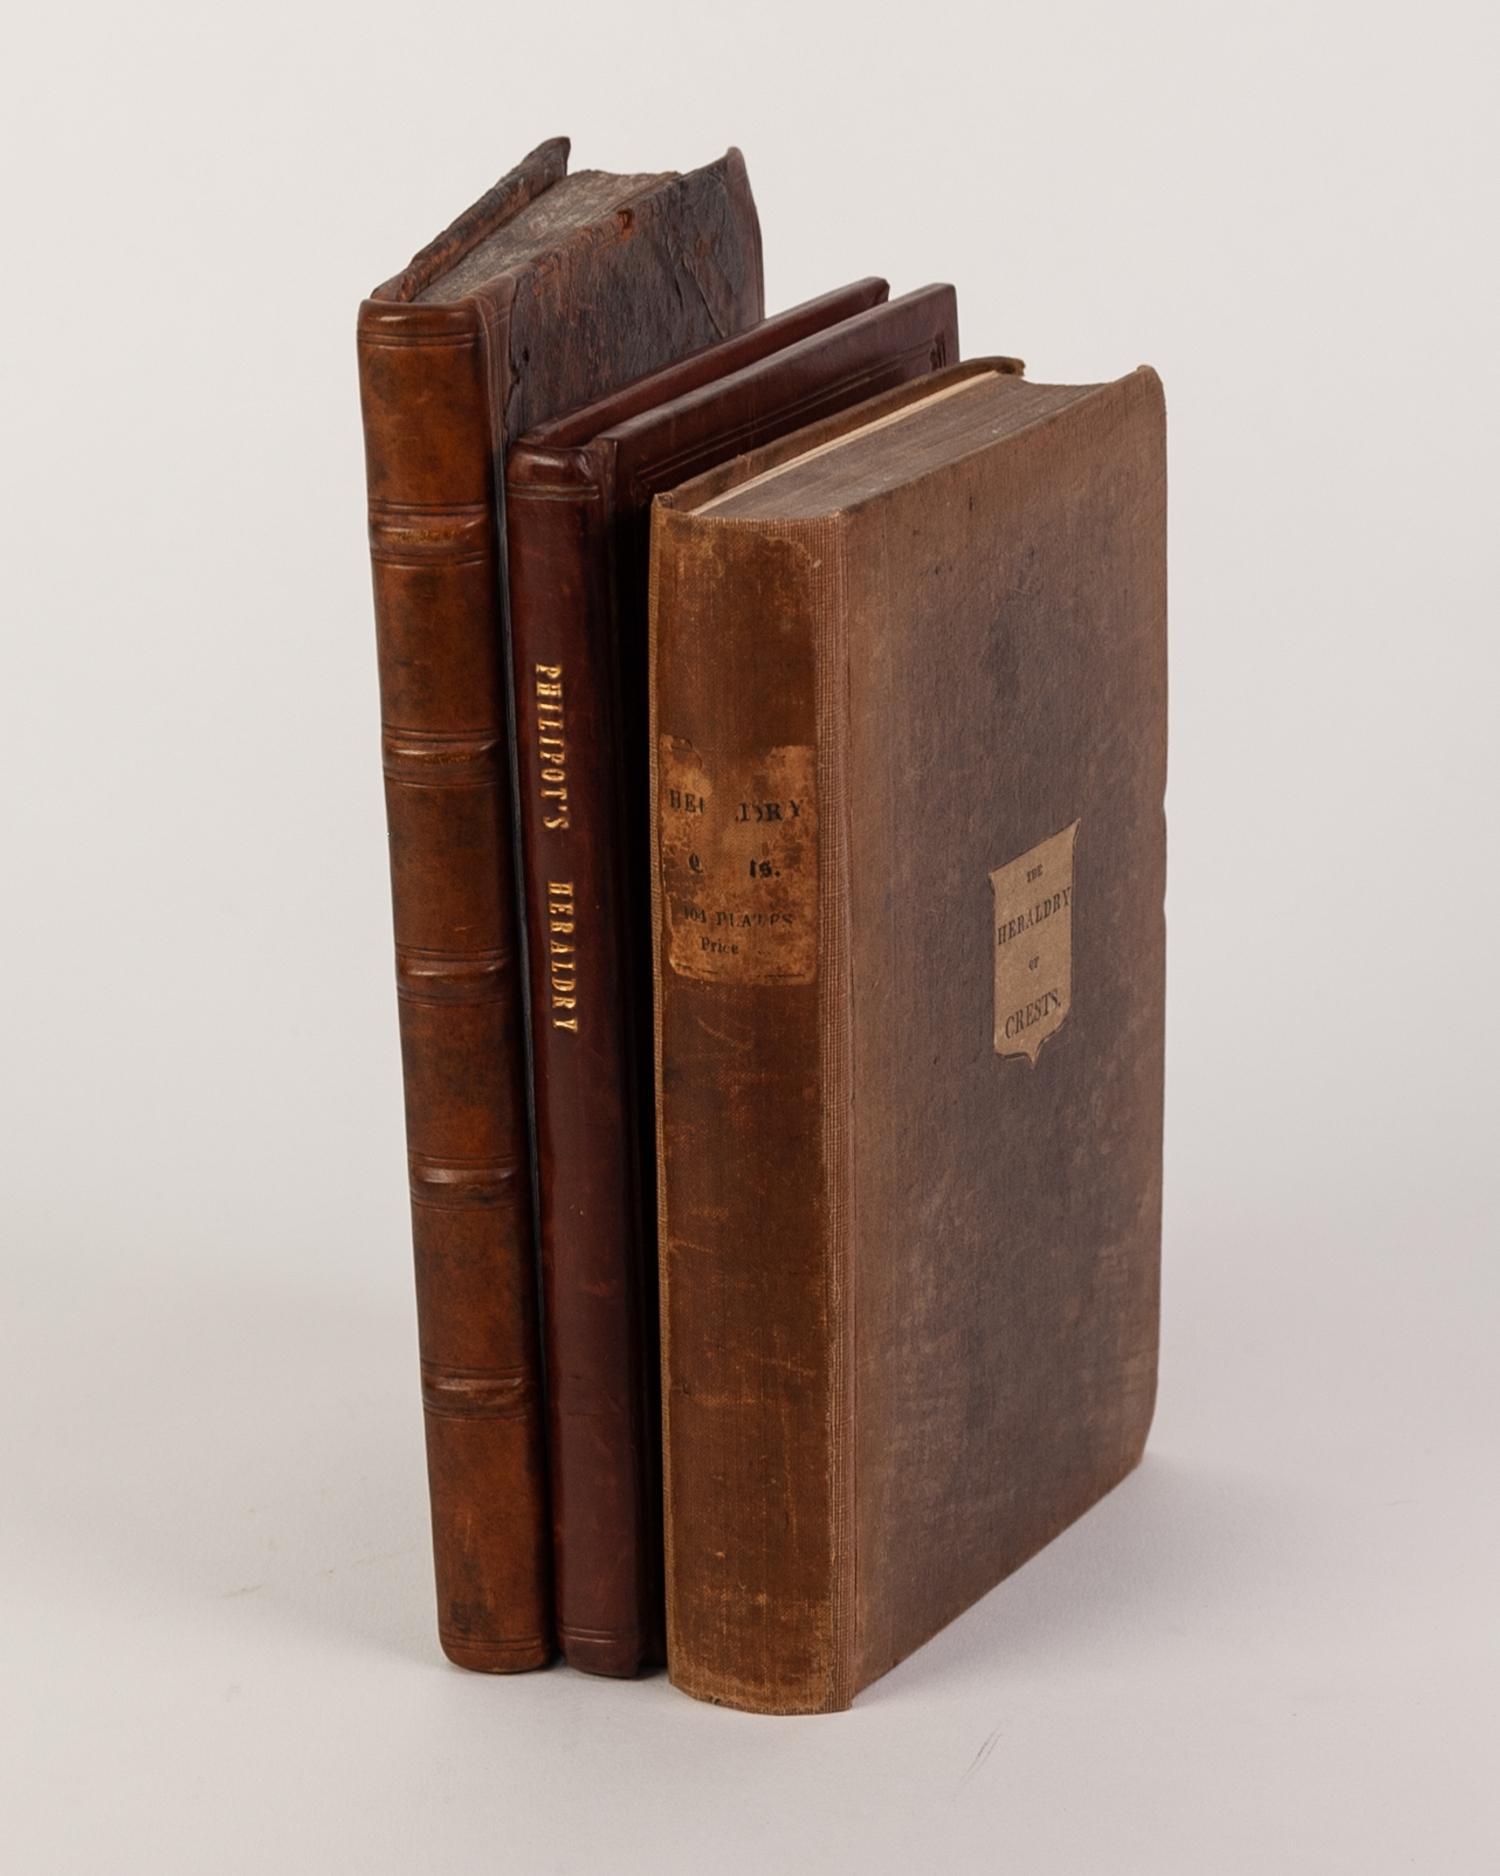 Lot 81 - HERALDRY- Johanne Gibbono- Introduction, Ad Latinum Blasonian, Essay to a more correct Blason,